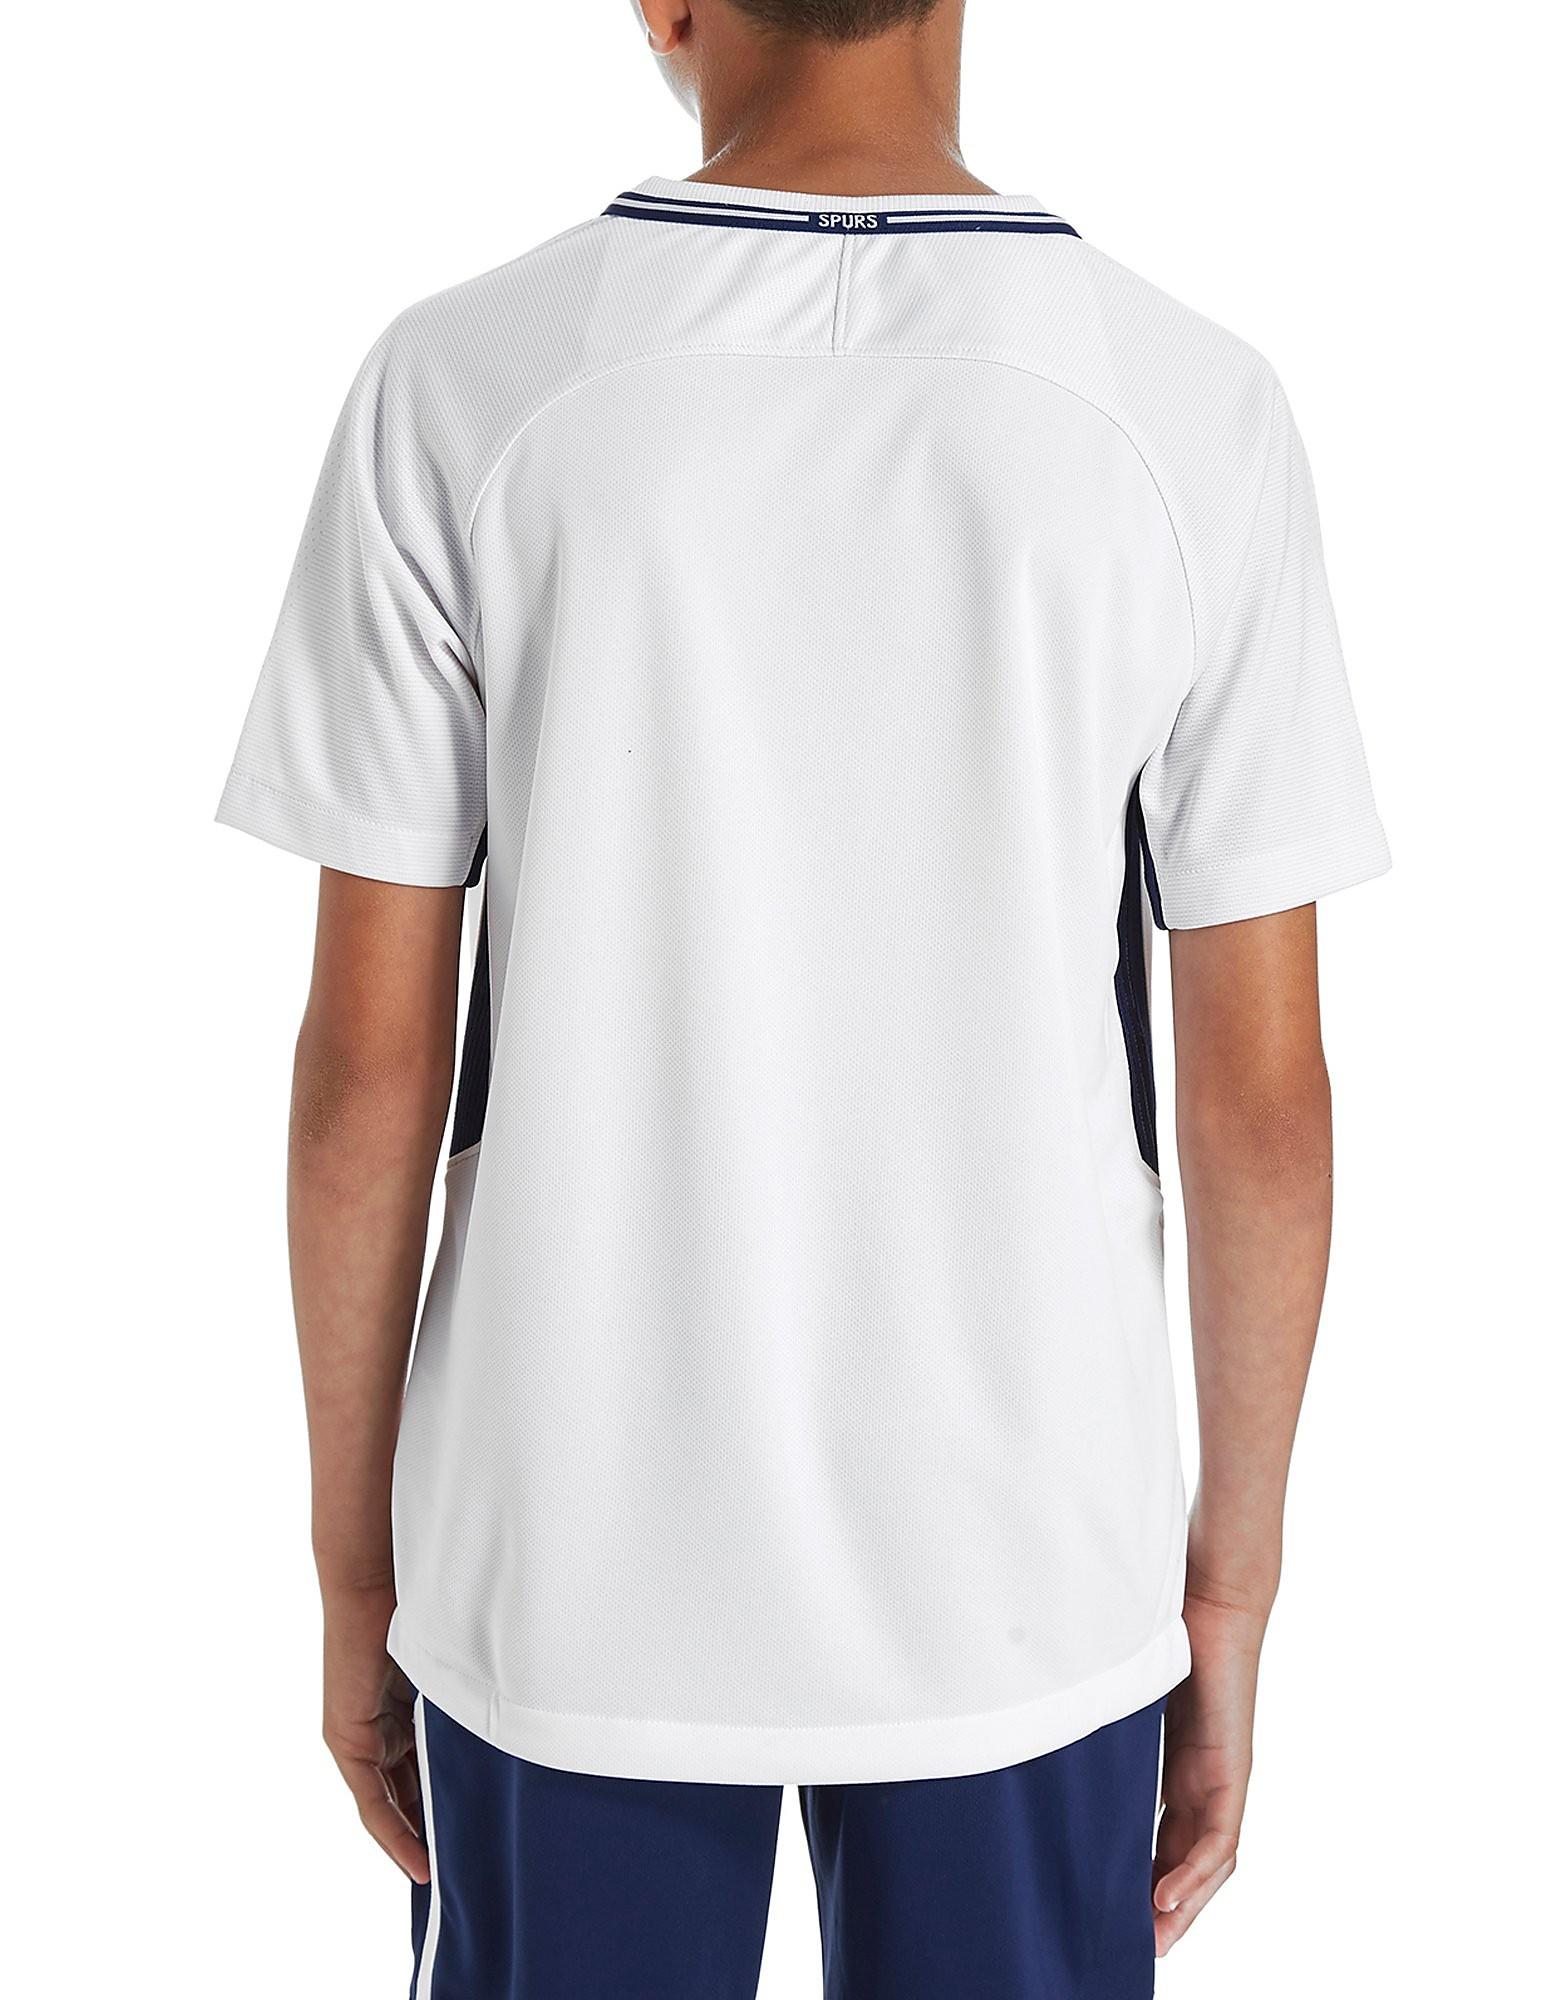 Nike Tottenham Hotspur 2017/18 Home Shirt Junior